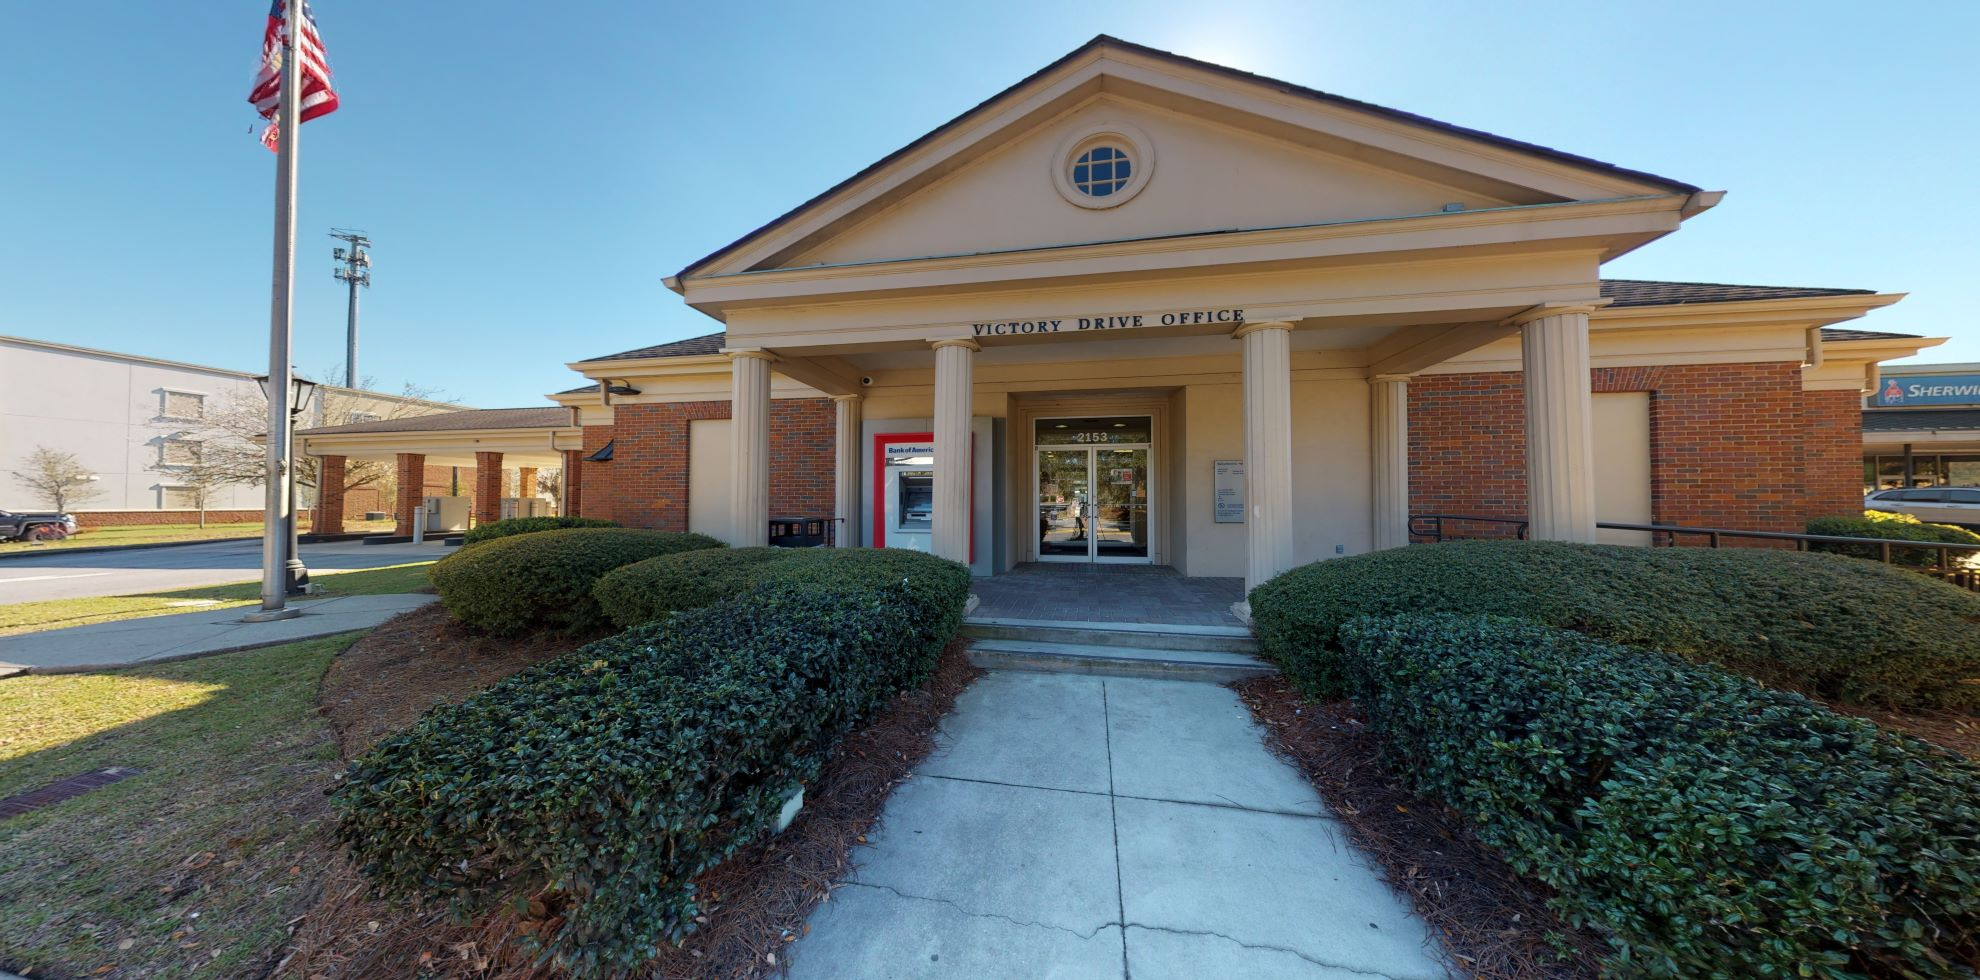 Bank of America financial center with drive-thru ATM   2153 E Victory Dr, Savannah, GA 31404